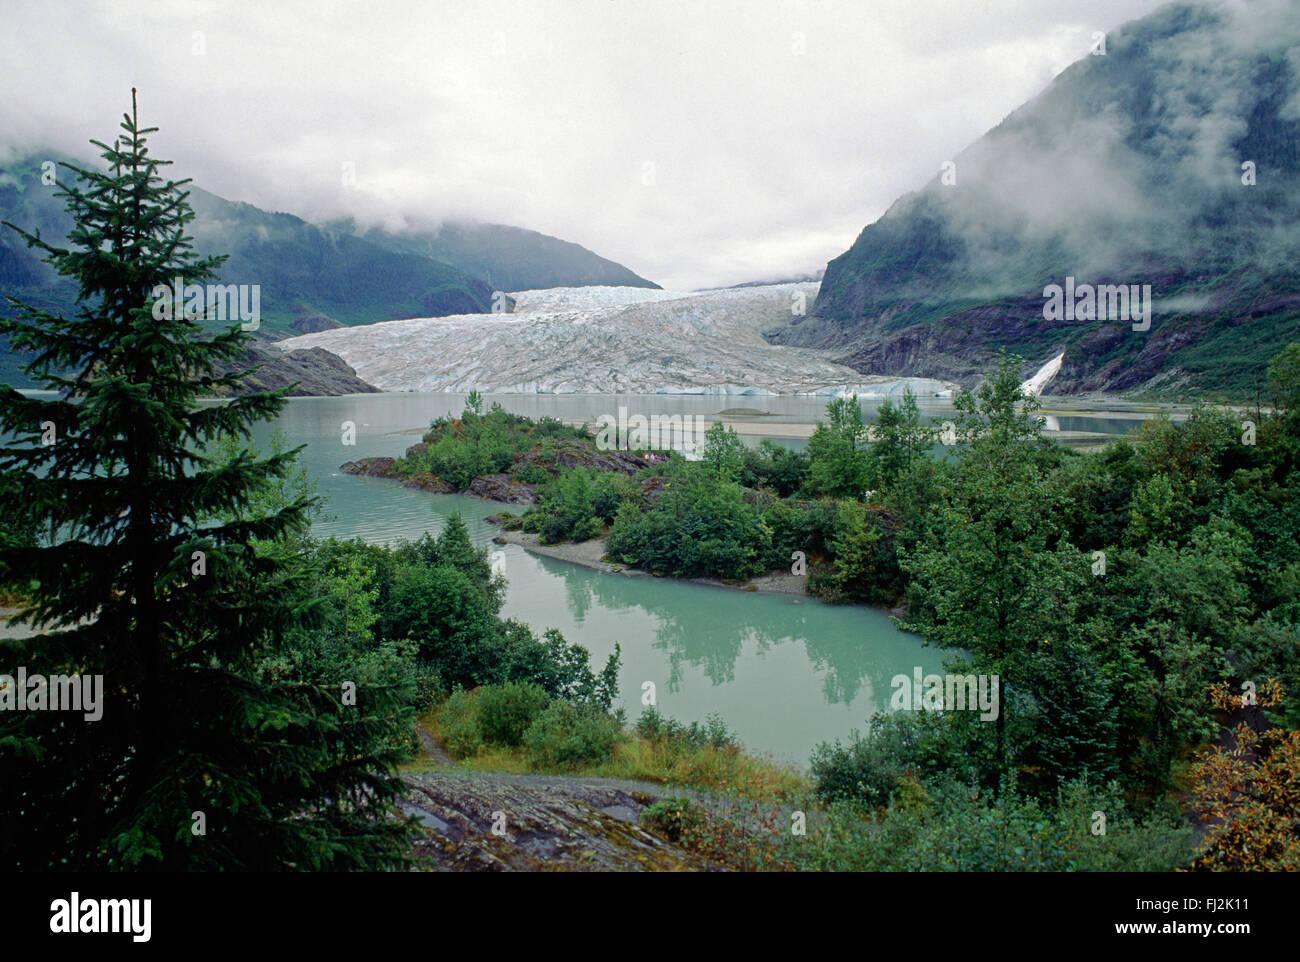 MENDENHALL GLACIER as seem frp, MENDENHALL LAKE - JUNEAU, ALASKA - Stock Image